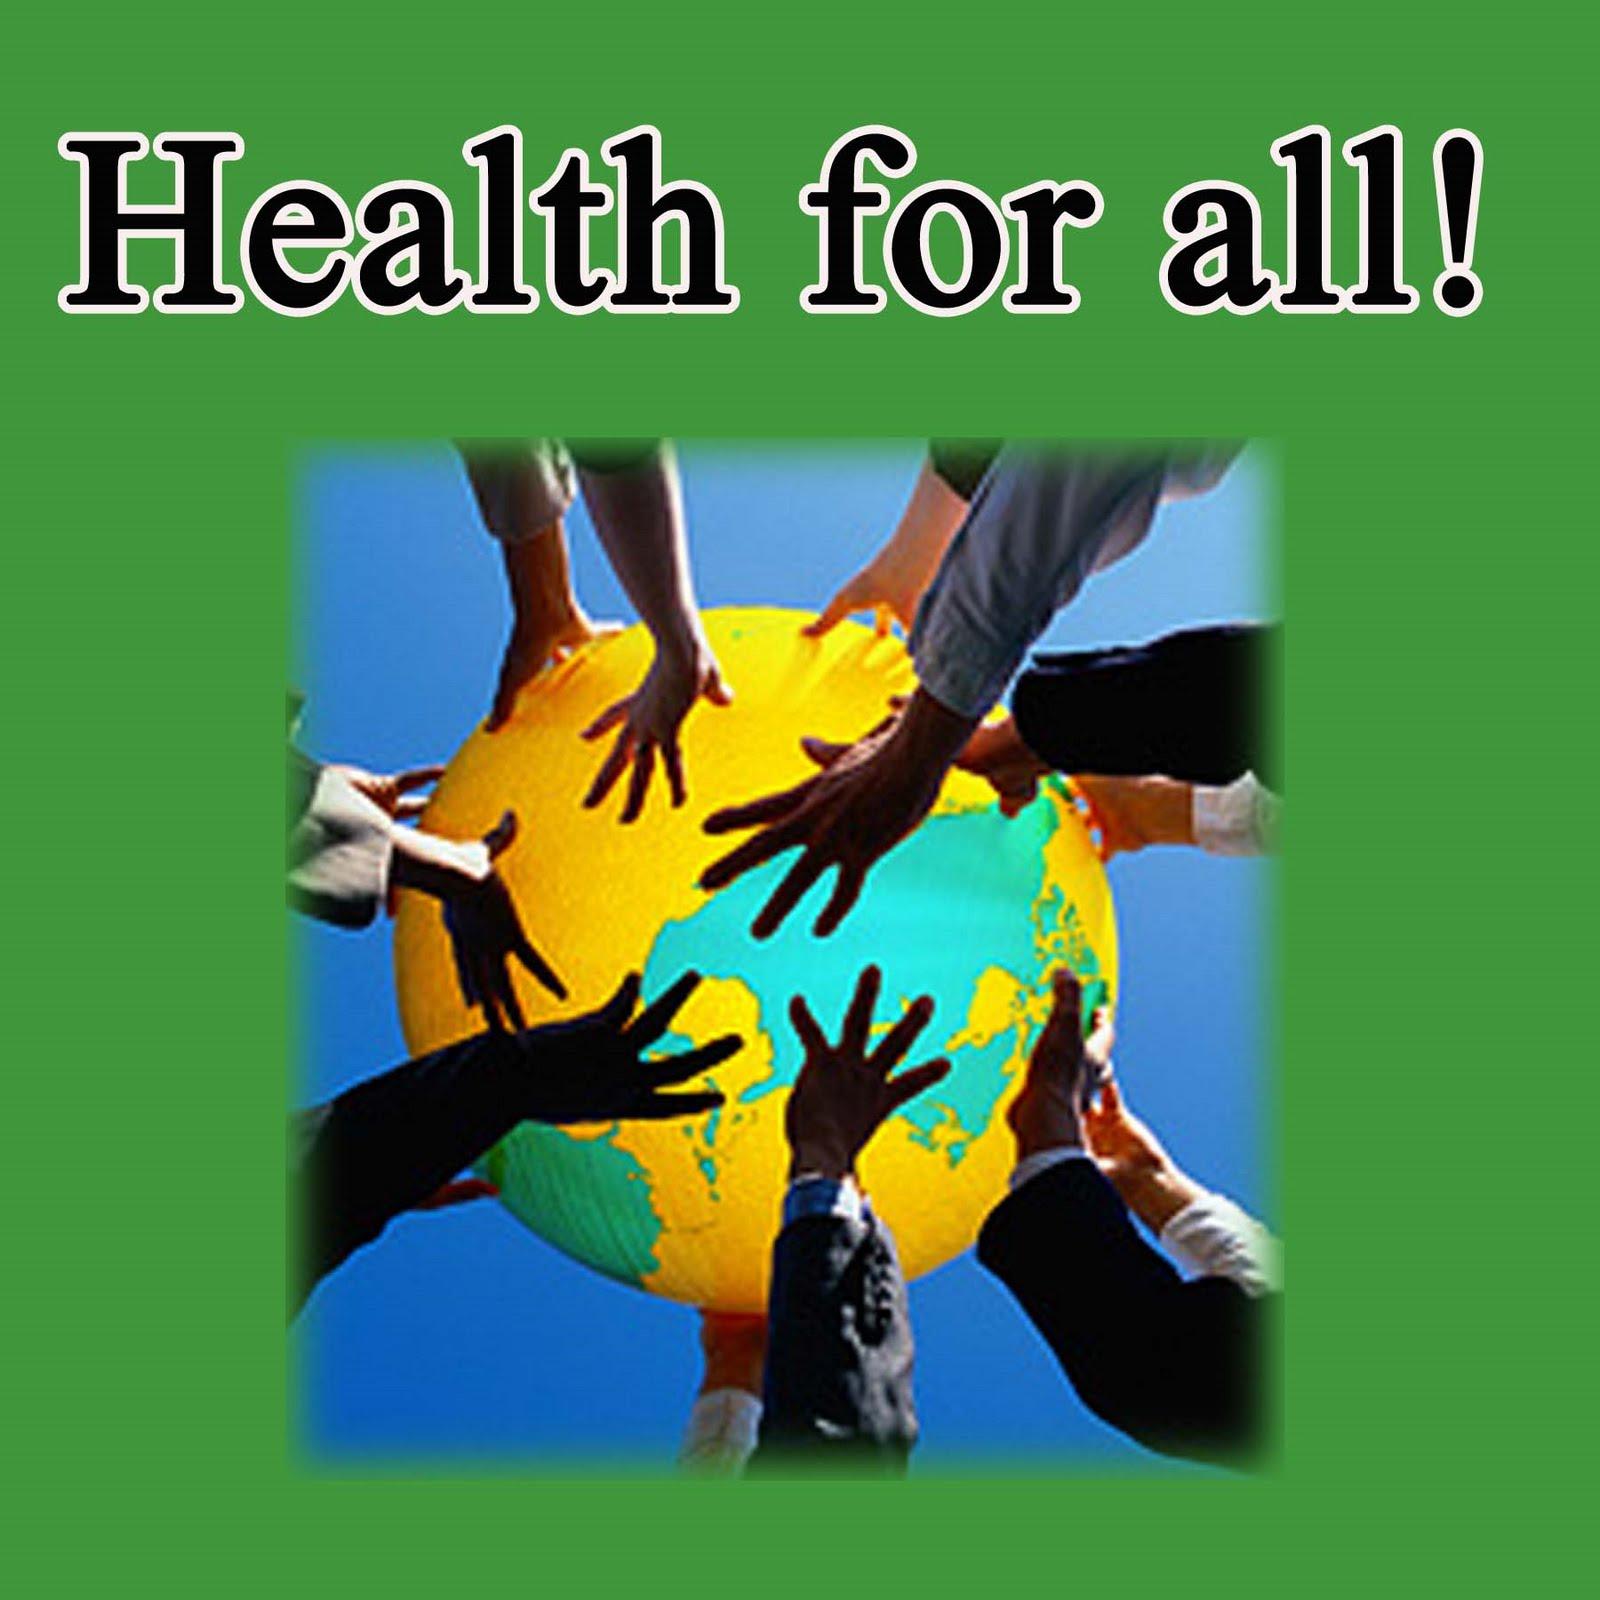 http://3.bp.blogspot.com/_ST7LOWIBxvk/TDv6VKEd9NI/AAAAAAAAAWA/EHmDzTVsU_A/s1600/health+for+all+copy.jpg